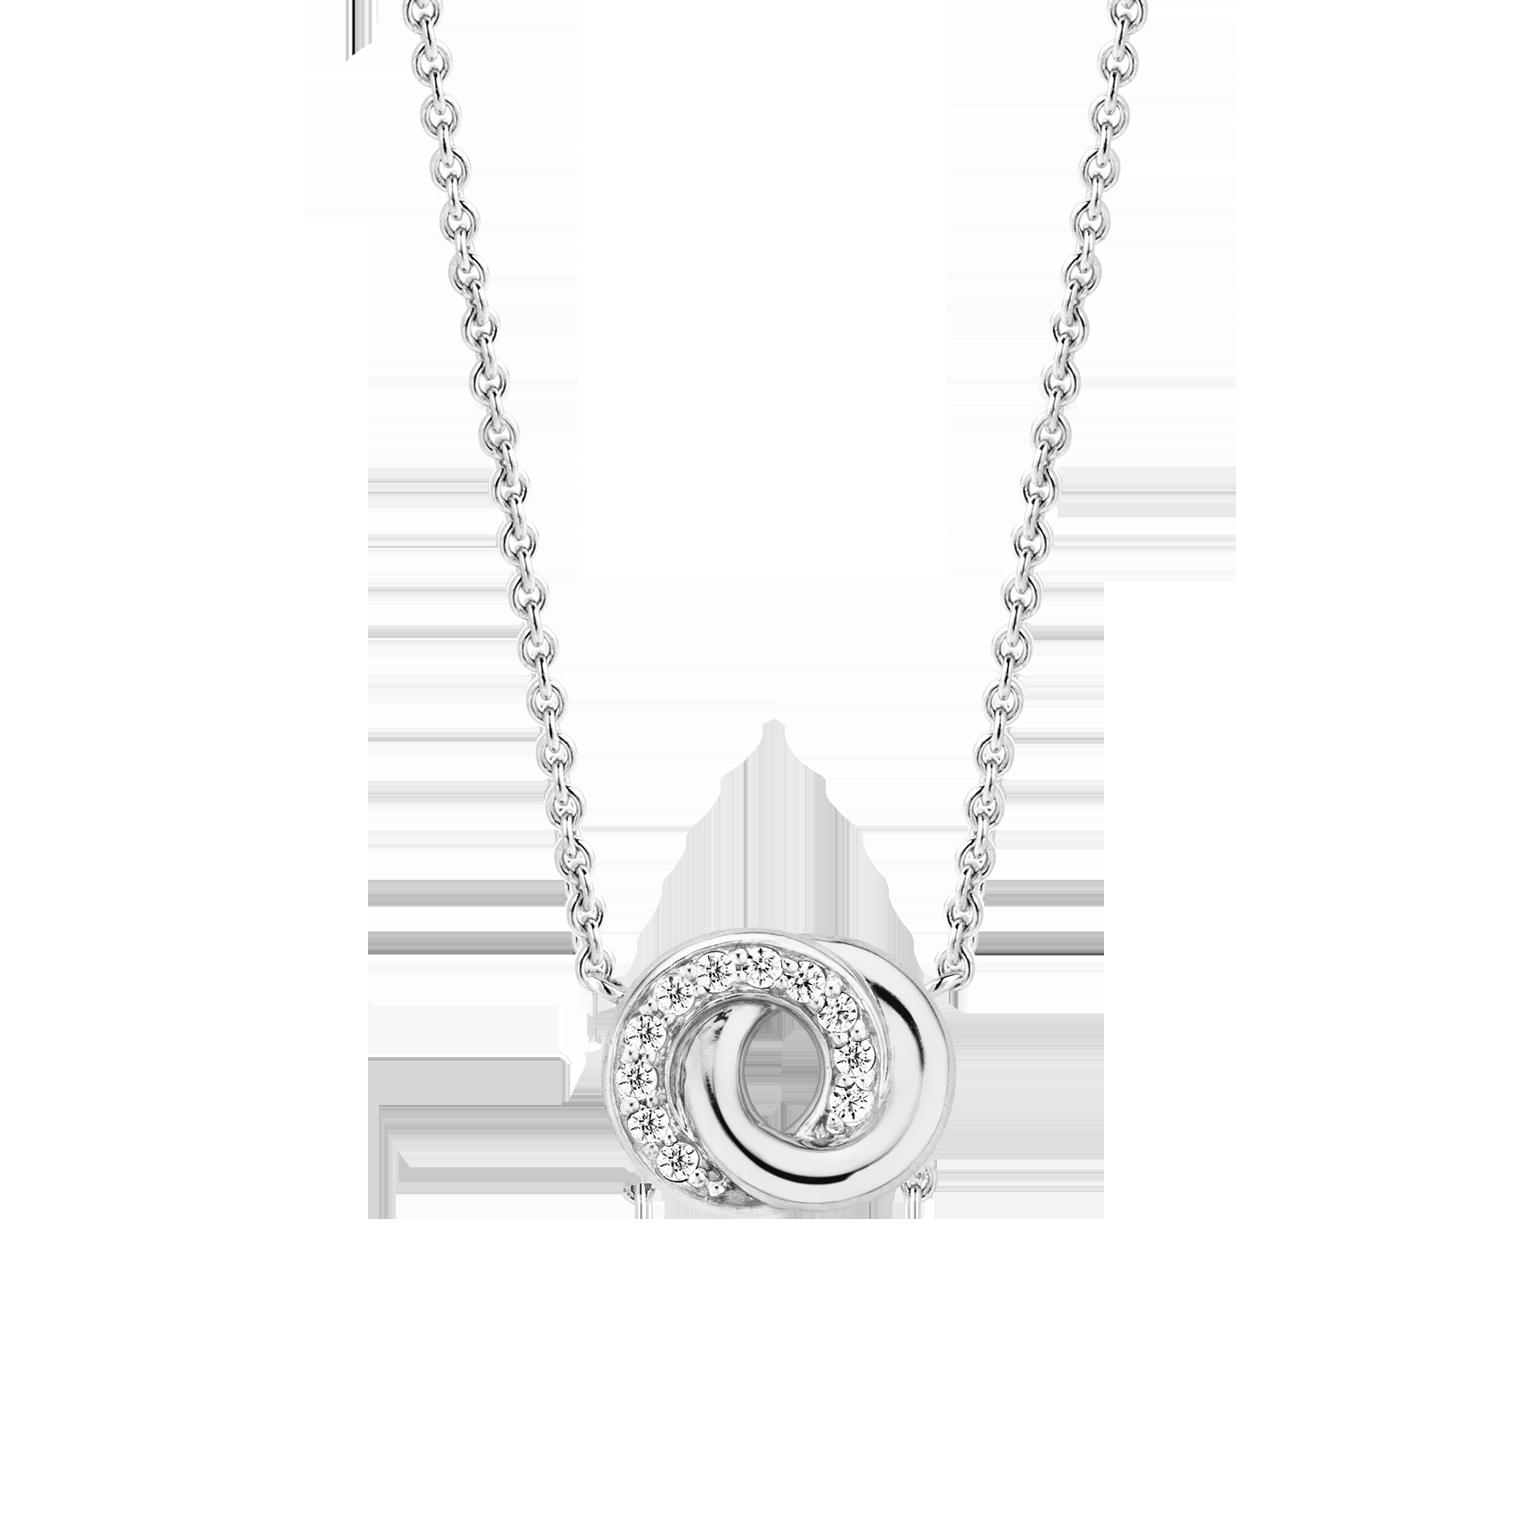 TI SENTO - Milano Necklace 3915ZI-1